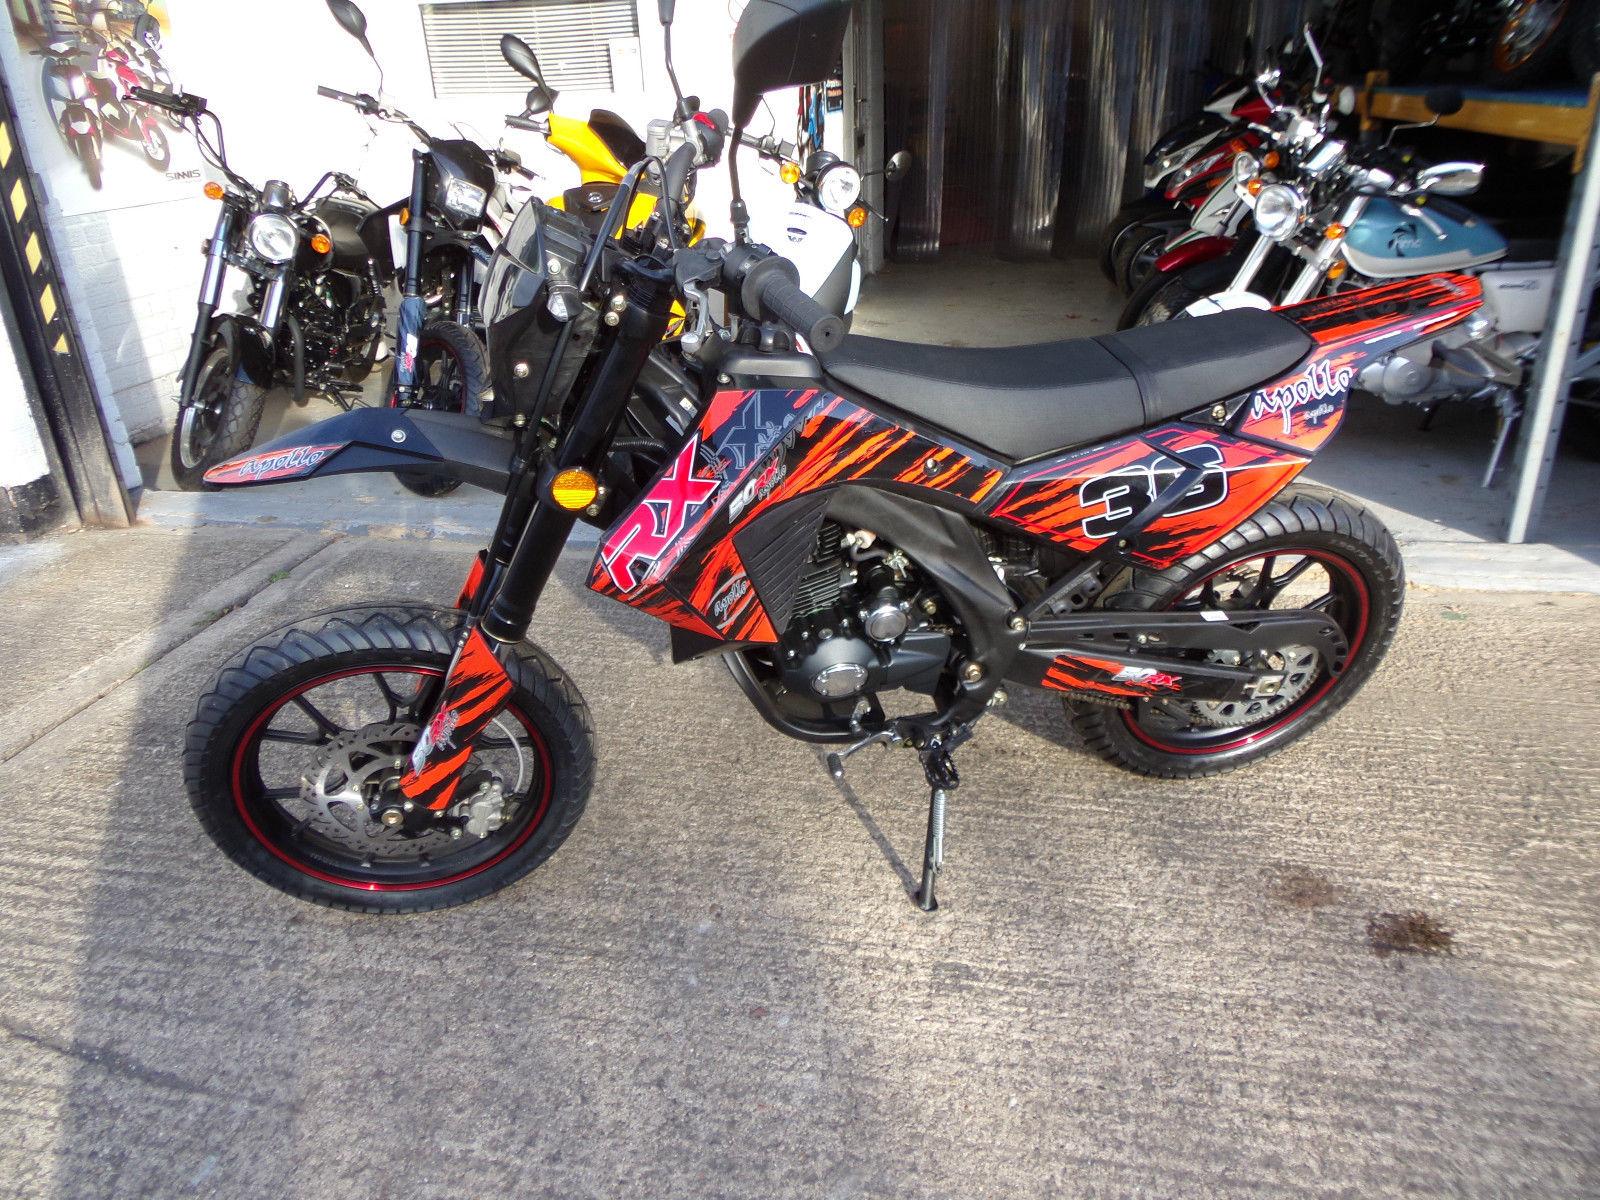 new apollo rx50 supermoto enduro 50cc moped motorbike. Black Bedroom Furniture Sets. Home Design Ideas